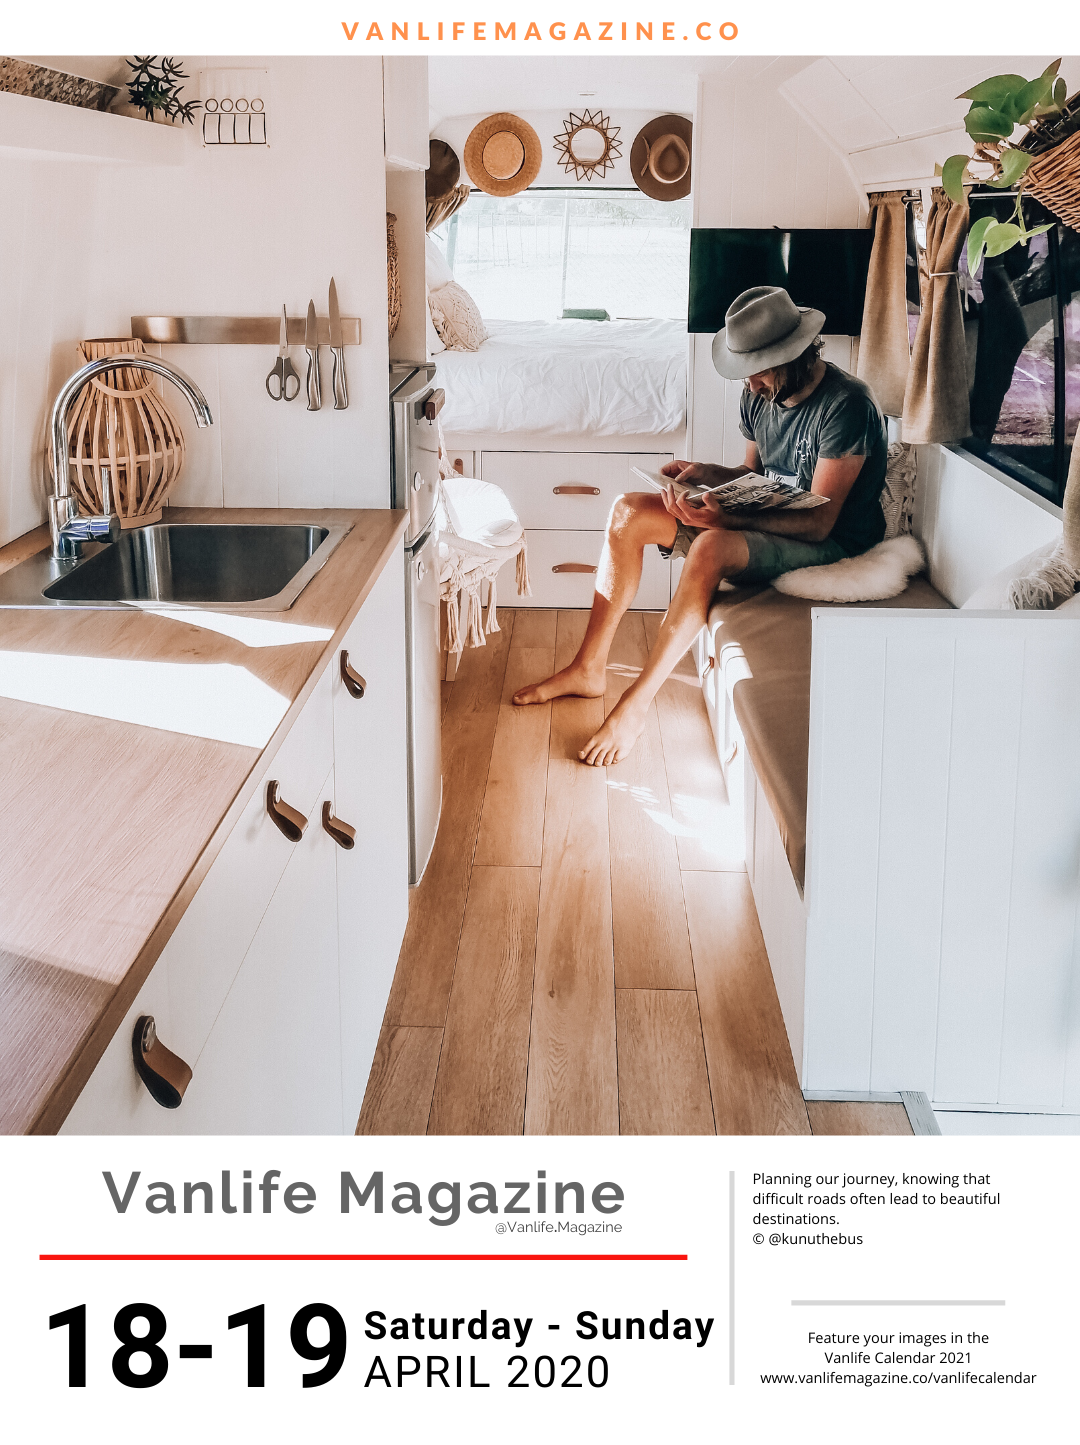 Vanlife Calendar 2020 Your daily vanlife inspiration